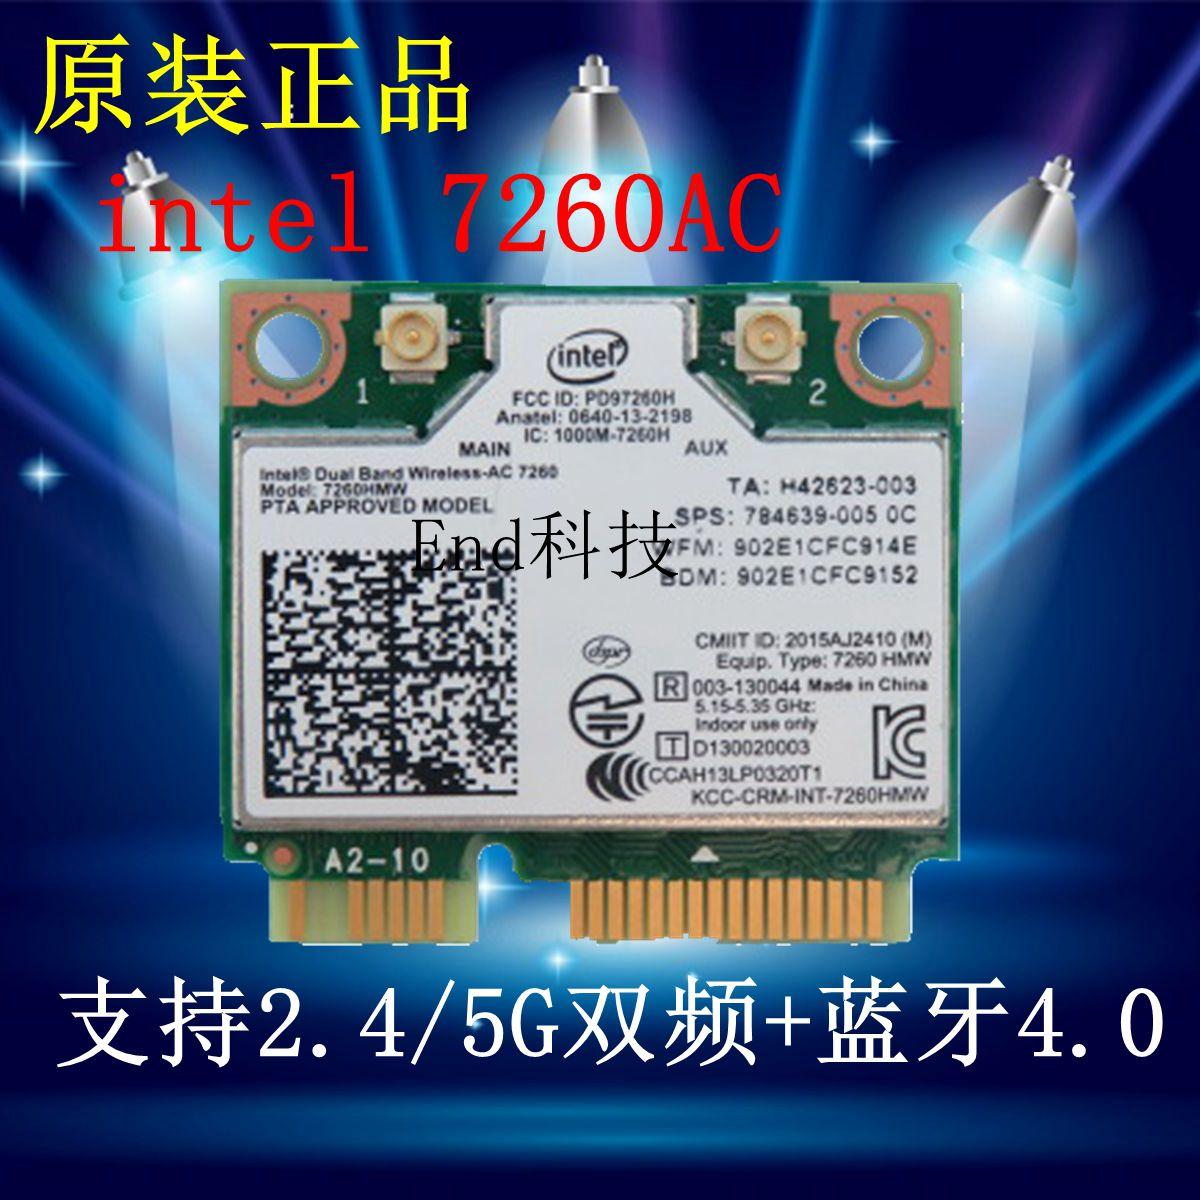 Intel 7260HMW  AC 无线网卡 867M 蓝牙4.0 双频5g WIFI千兆